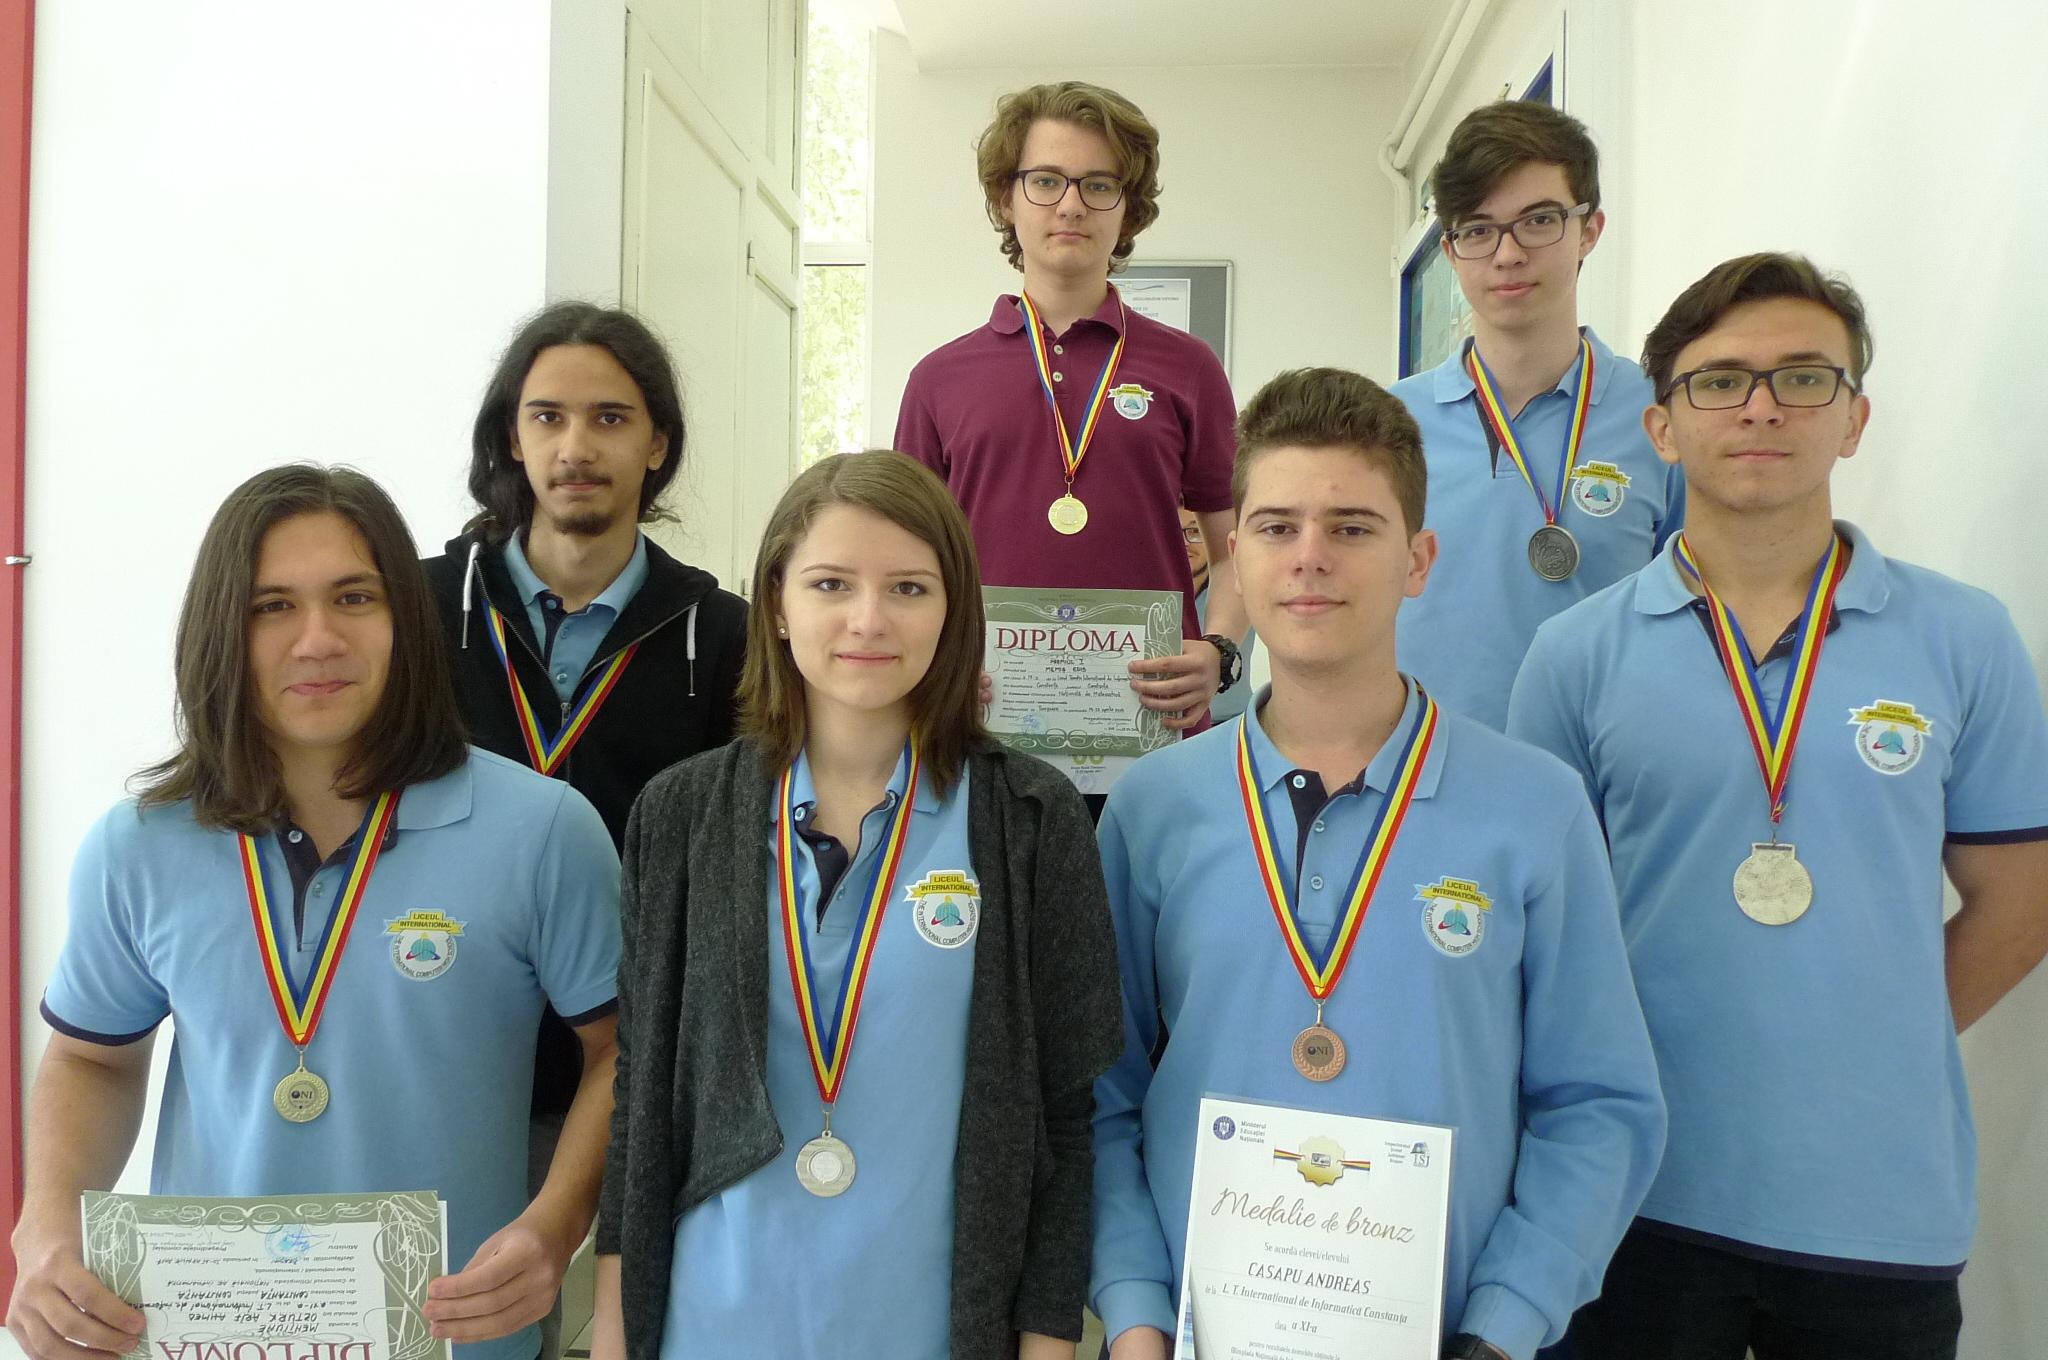 Informaticieni de aur, argint si bronz la Olimpiada de Informatica